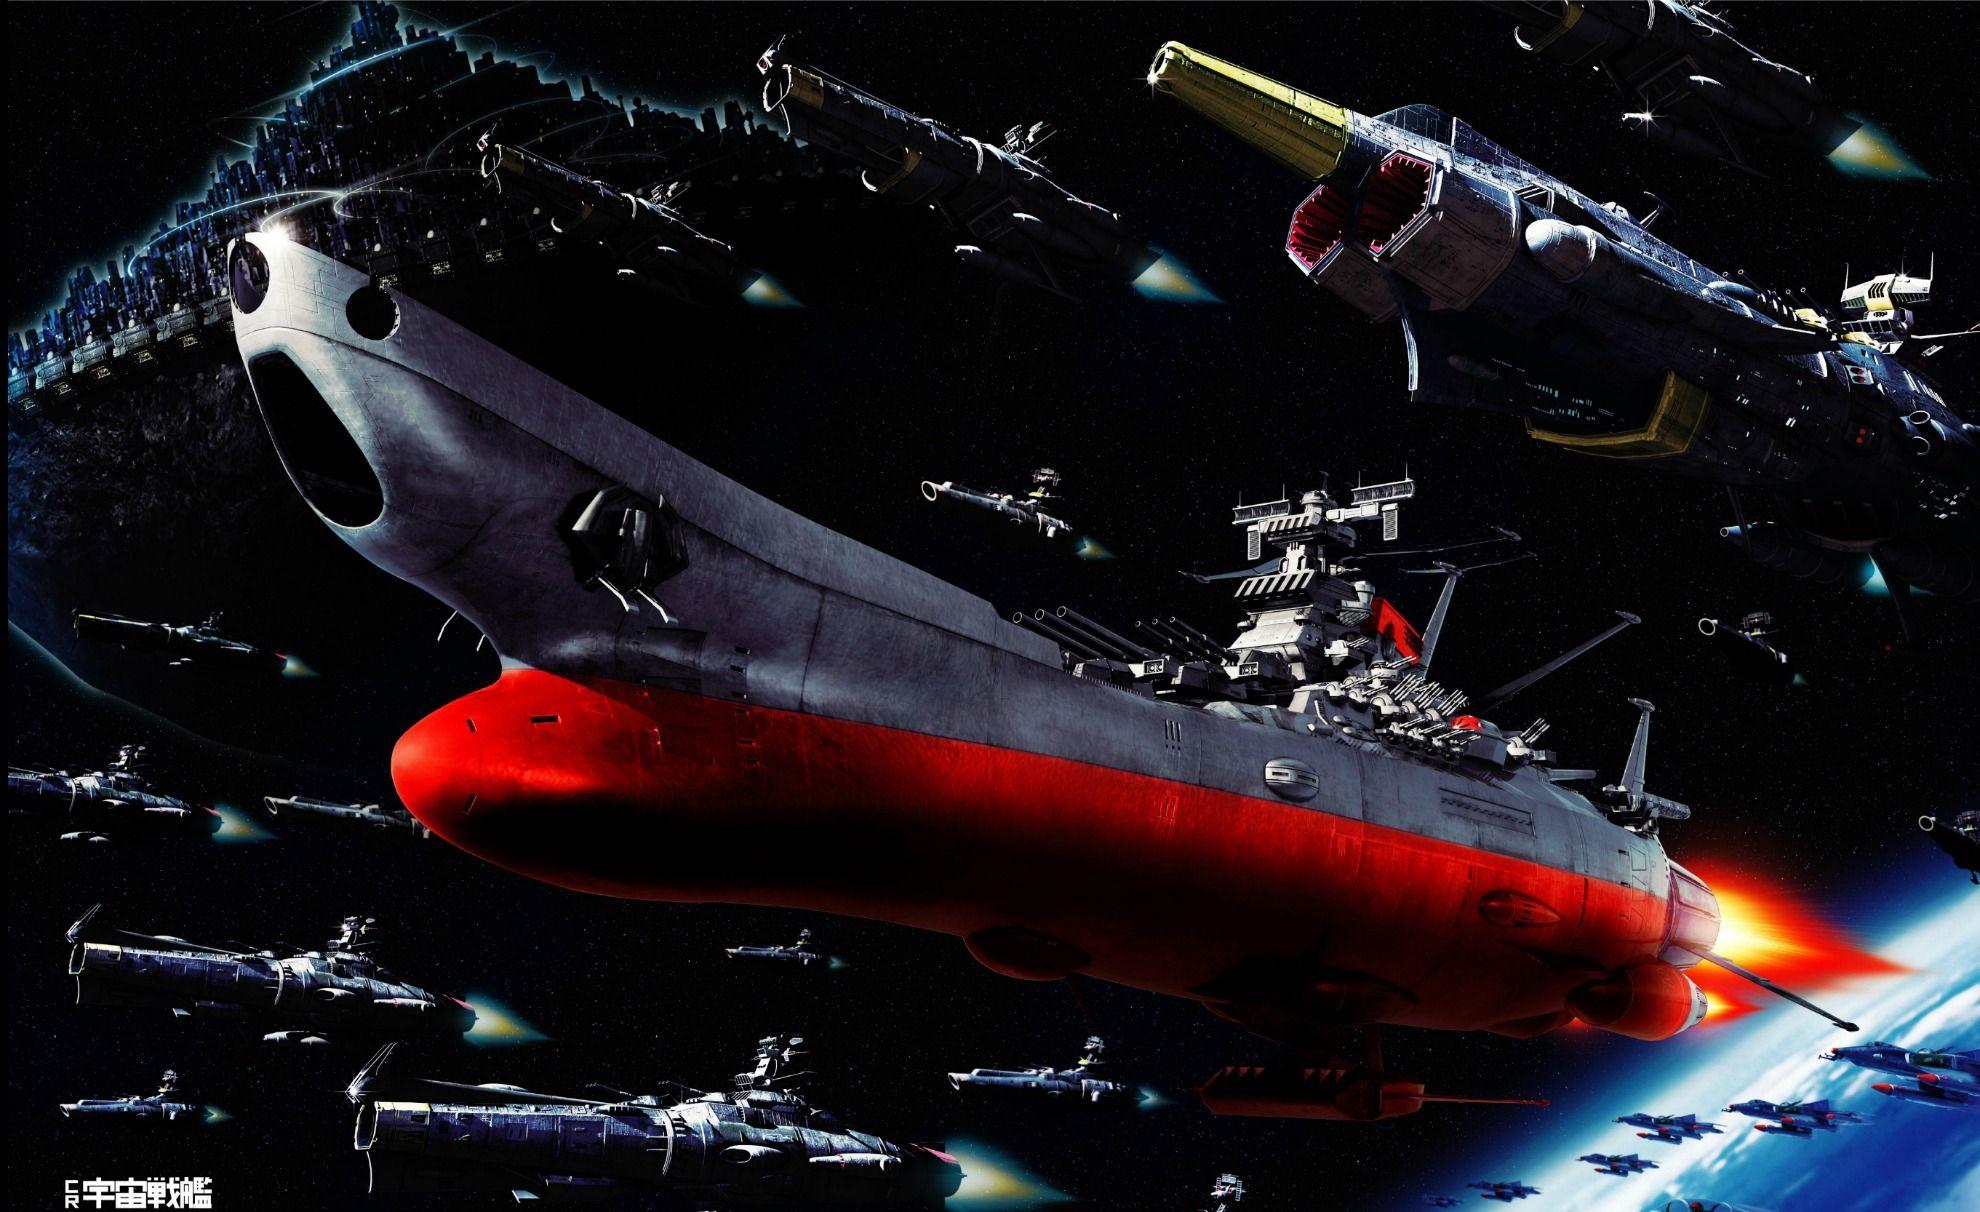 Sci Fi Spaceship Wallpaper Star Blazers Yamato Space Battleship